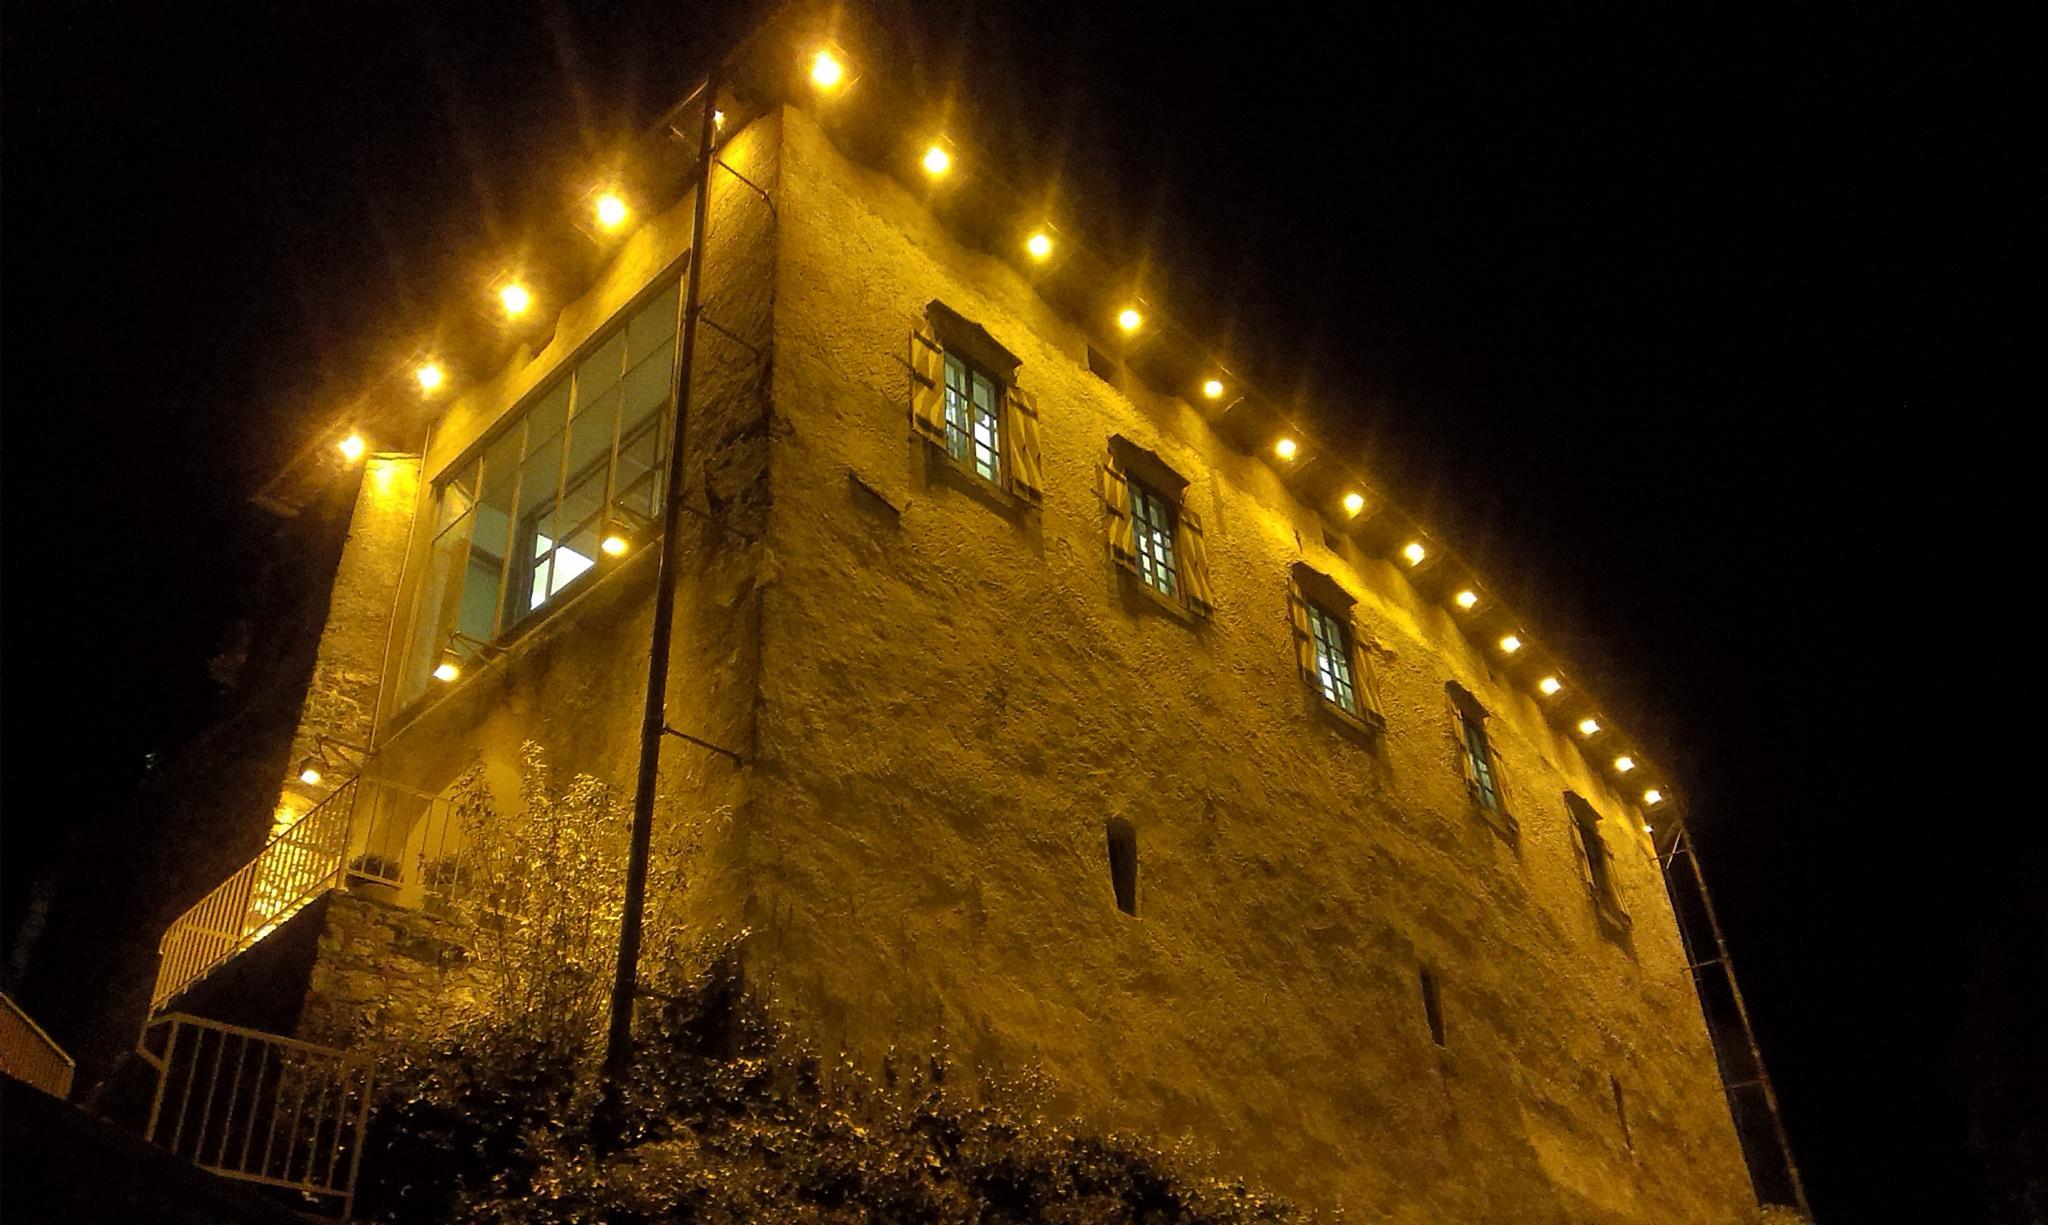 Bled Castle by hasan.senicak